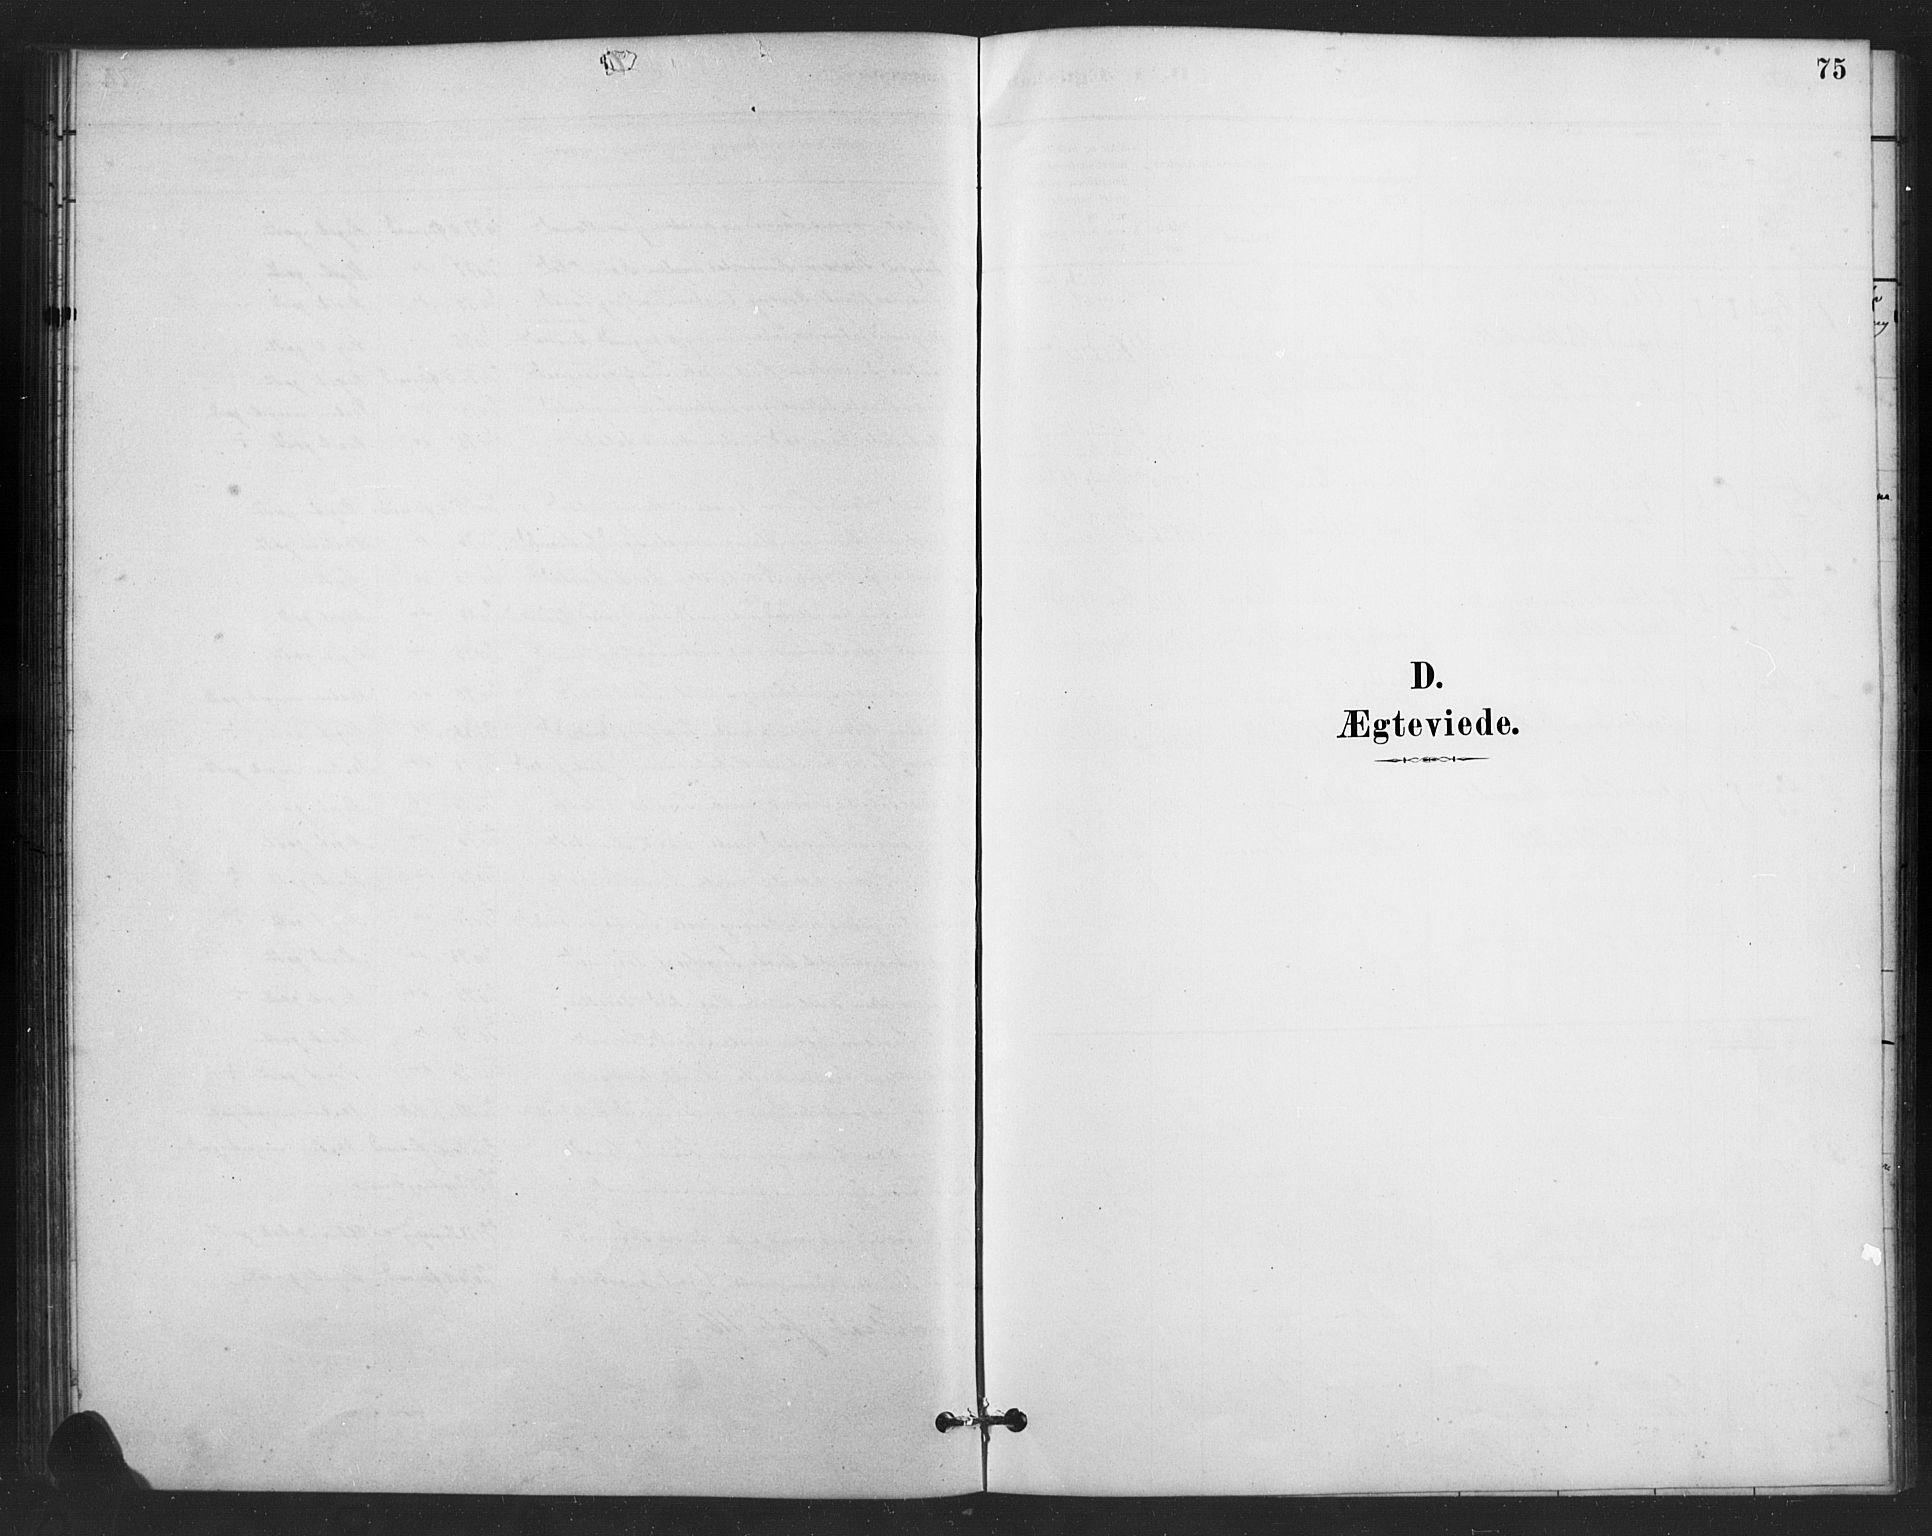 SAH, Vestre Slidre prestekontor, Klokkerbok nr. 6, 1881-1915, s. 75